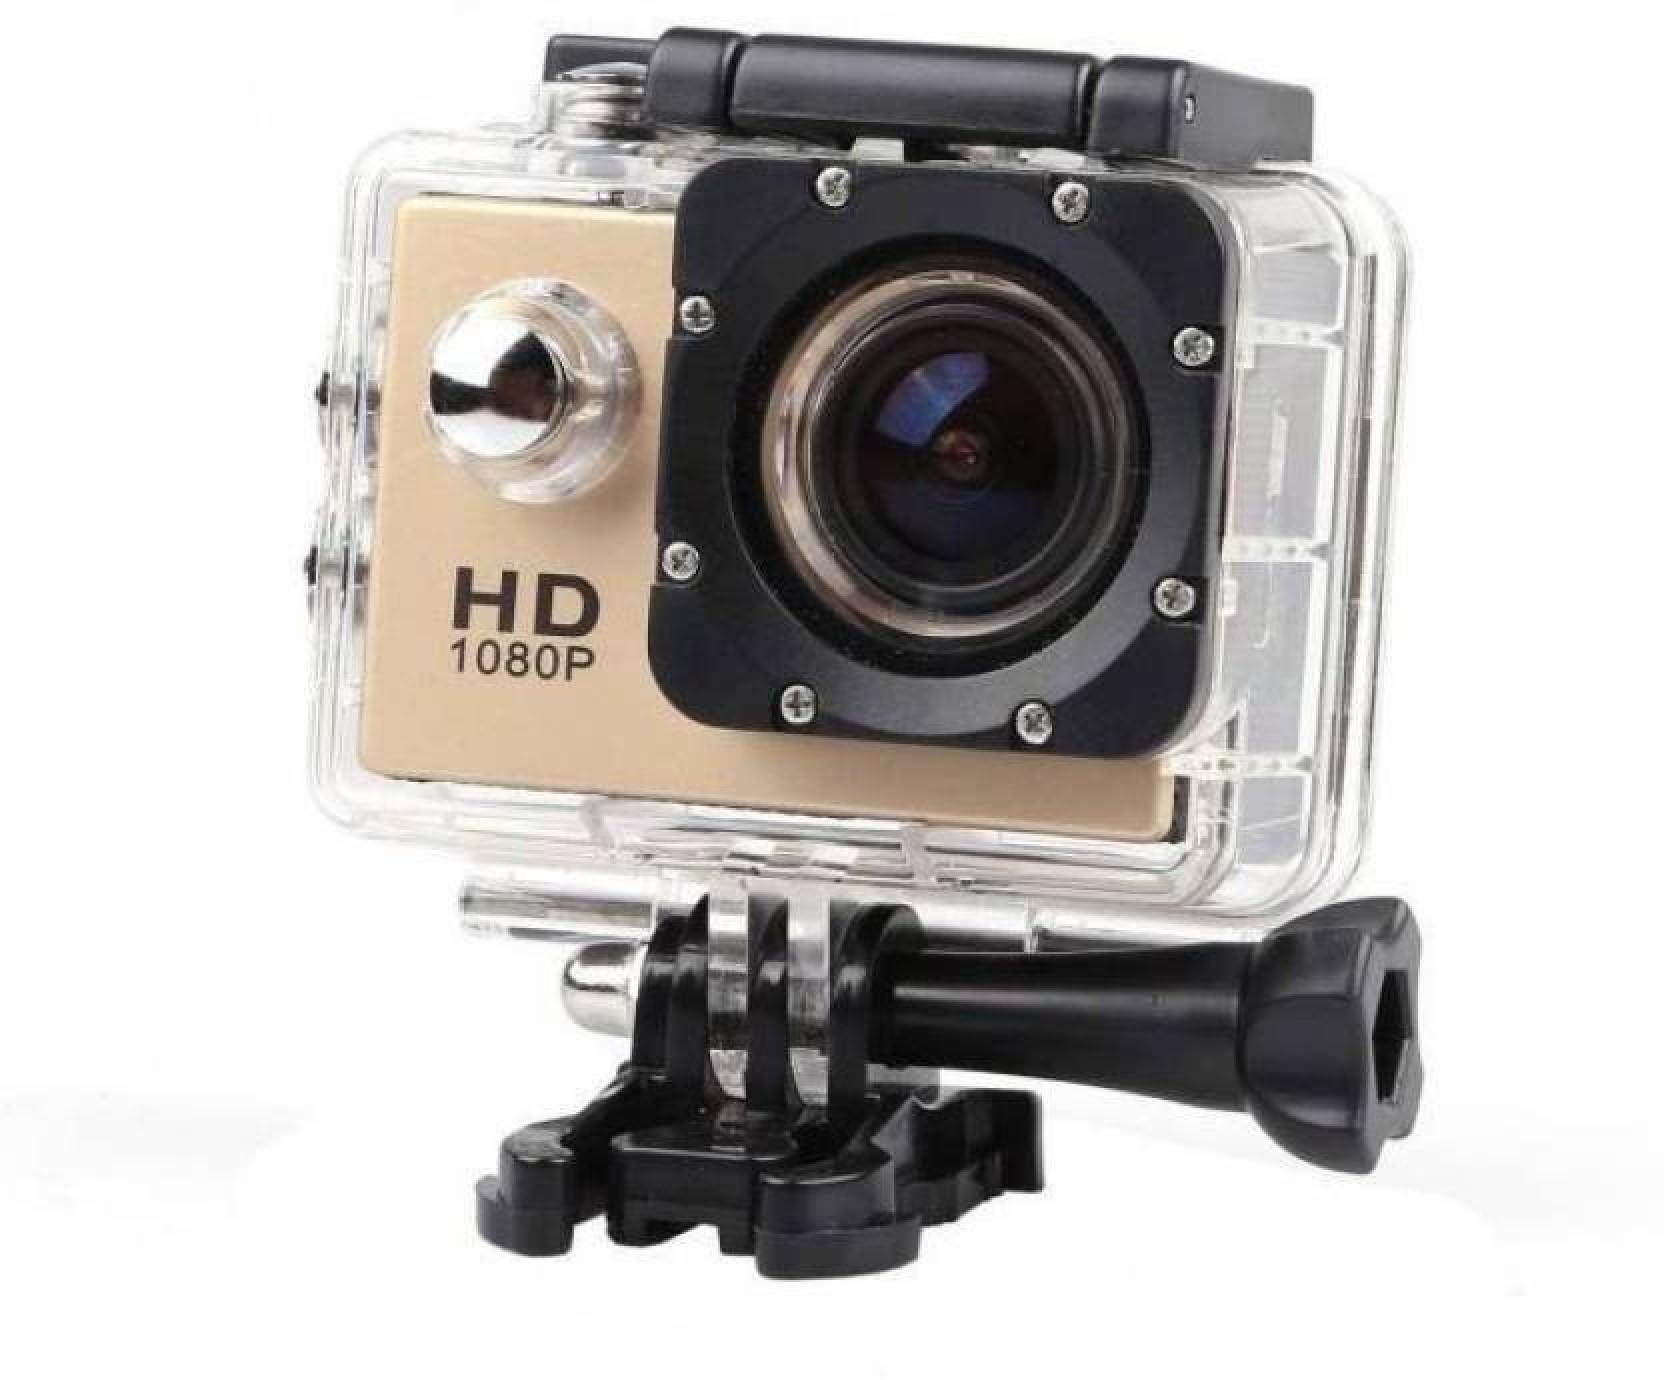 Nick Jones 4k Wifi 1080 New Ultra Hd Action Camera 1080p Video Sportcam 16 Mp Recording Go Pro Add To Cart